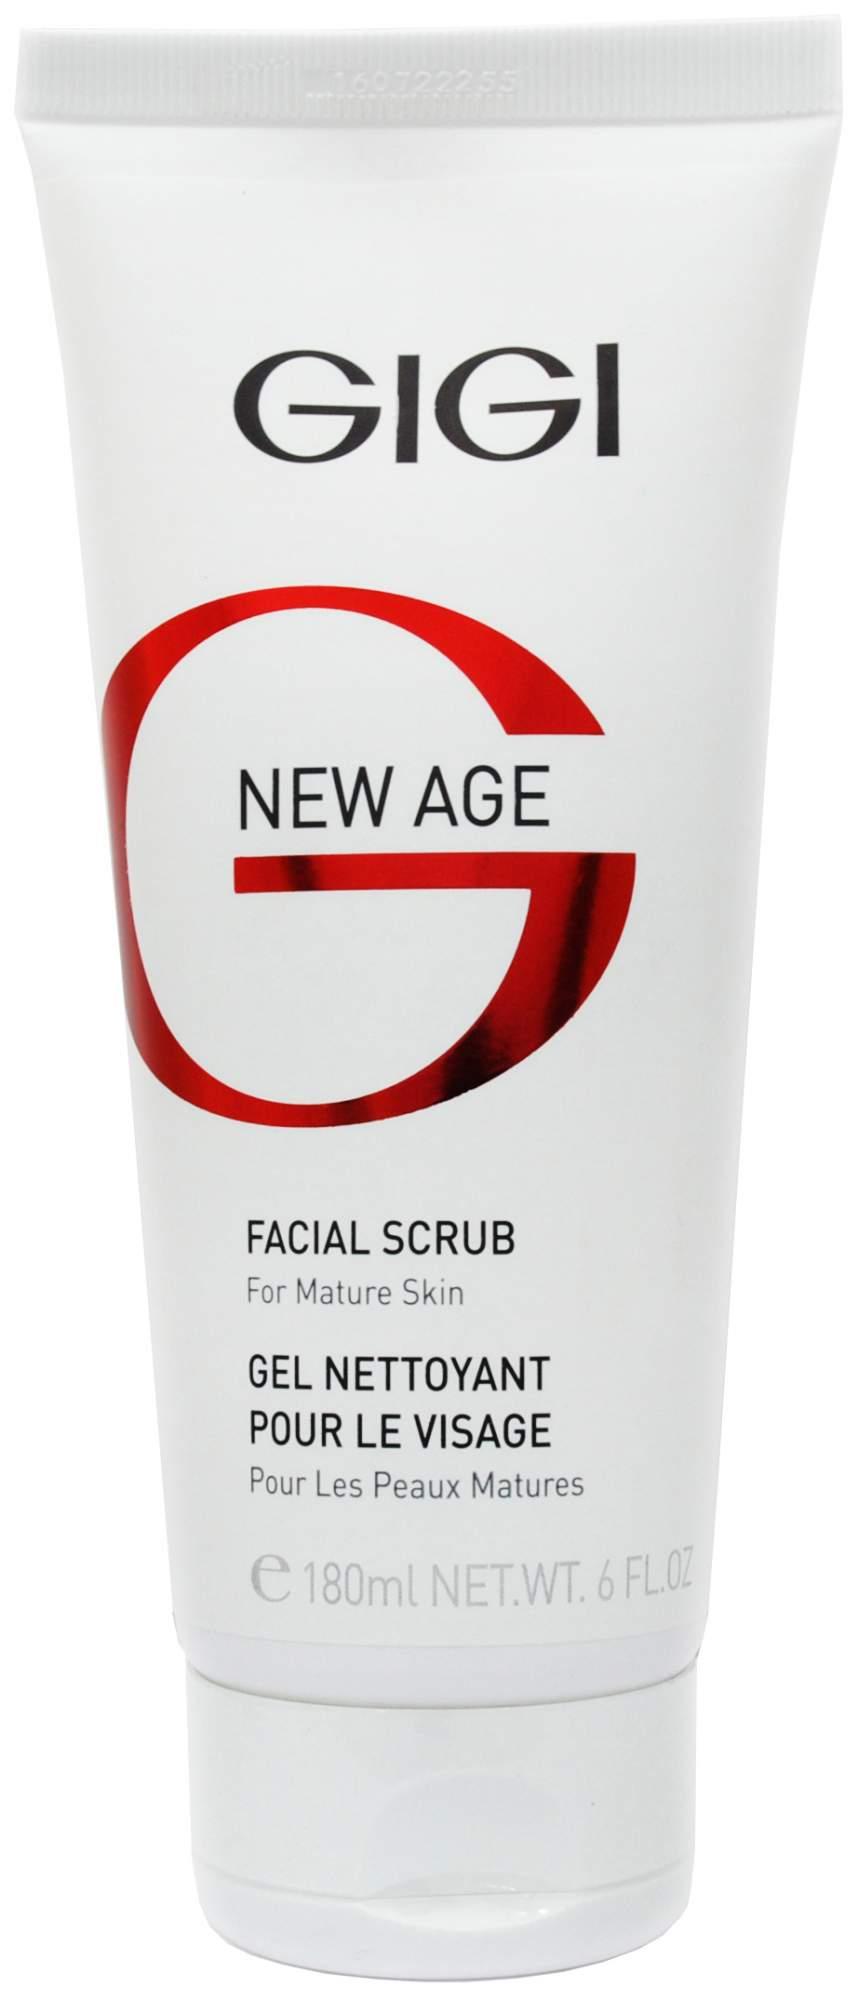 Купить Скраб для лица GIGI New Age Facial Scrub 180 мл